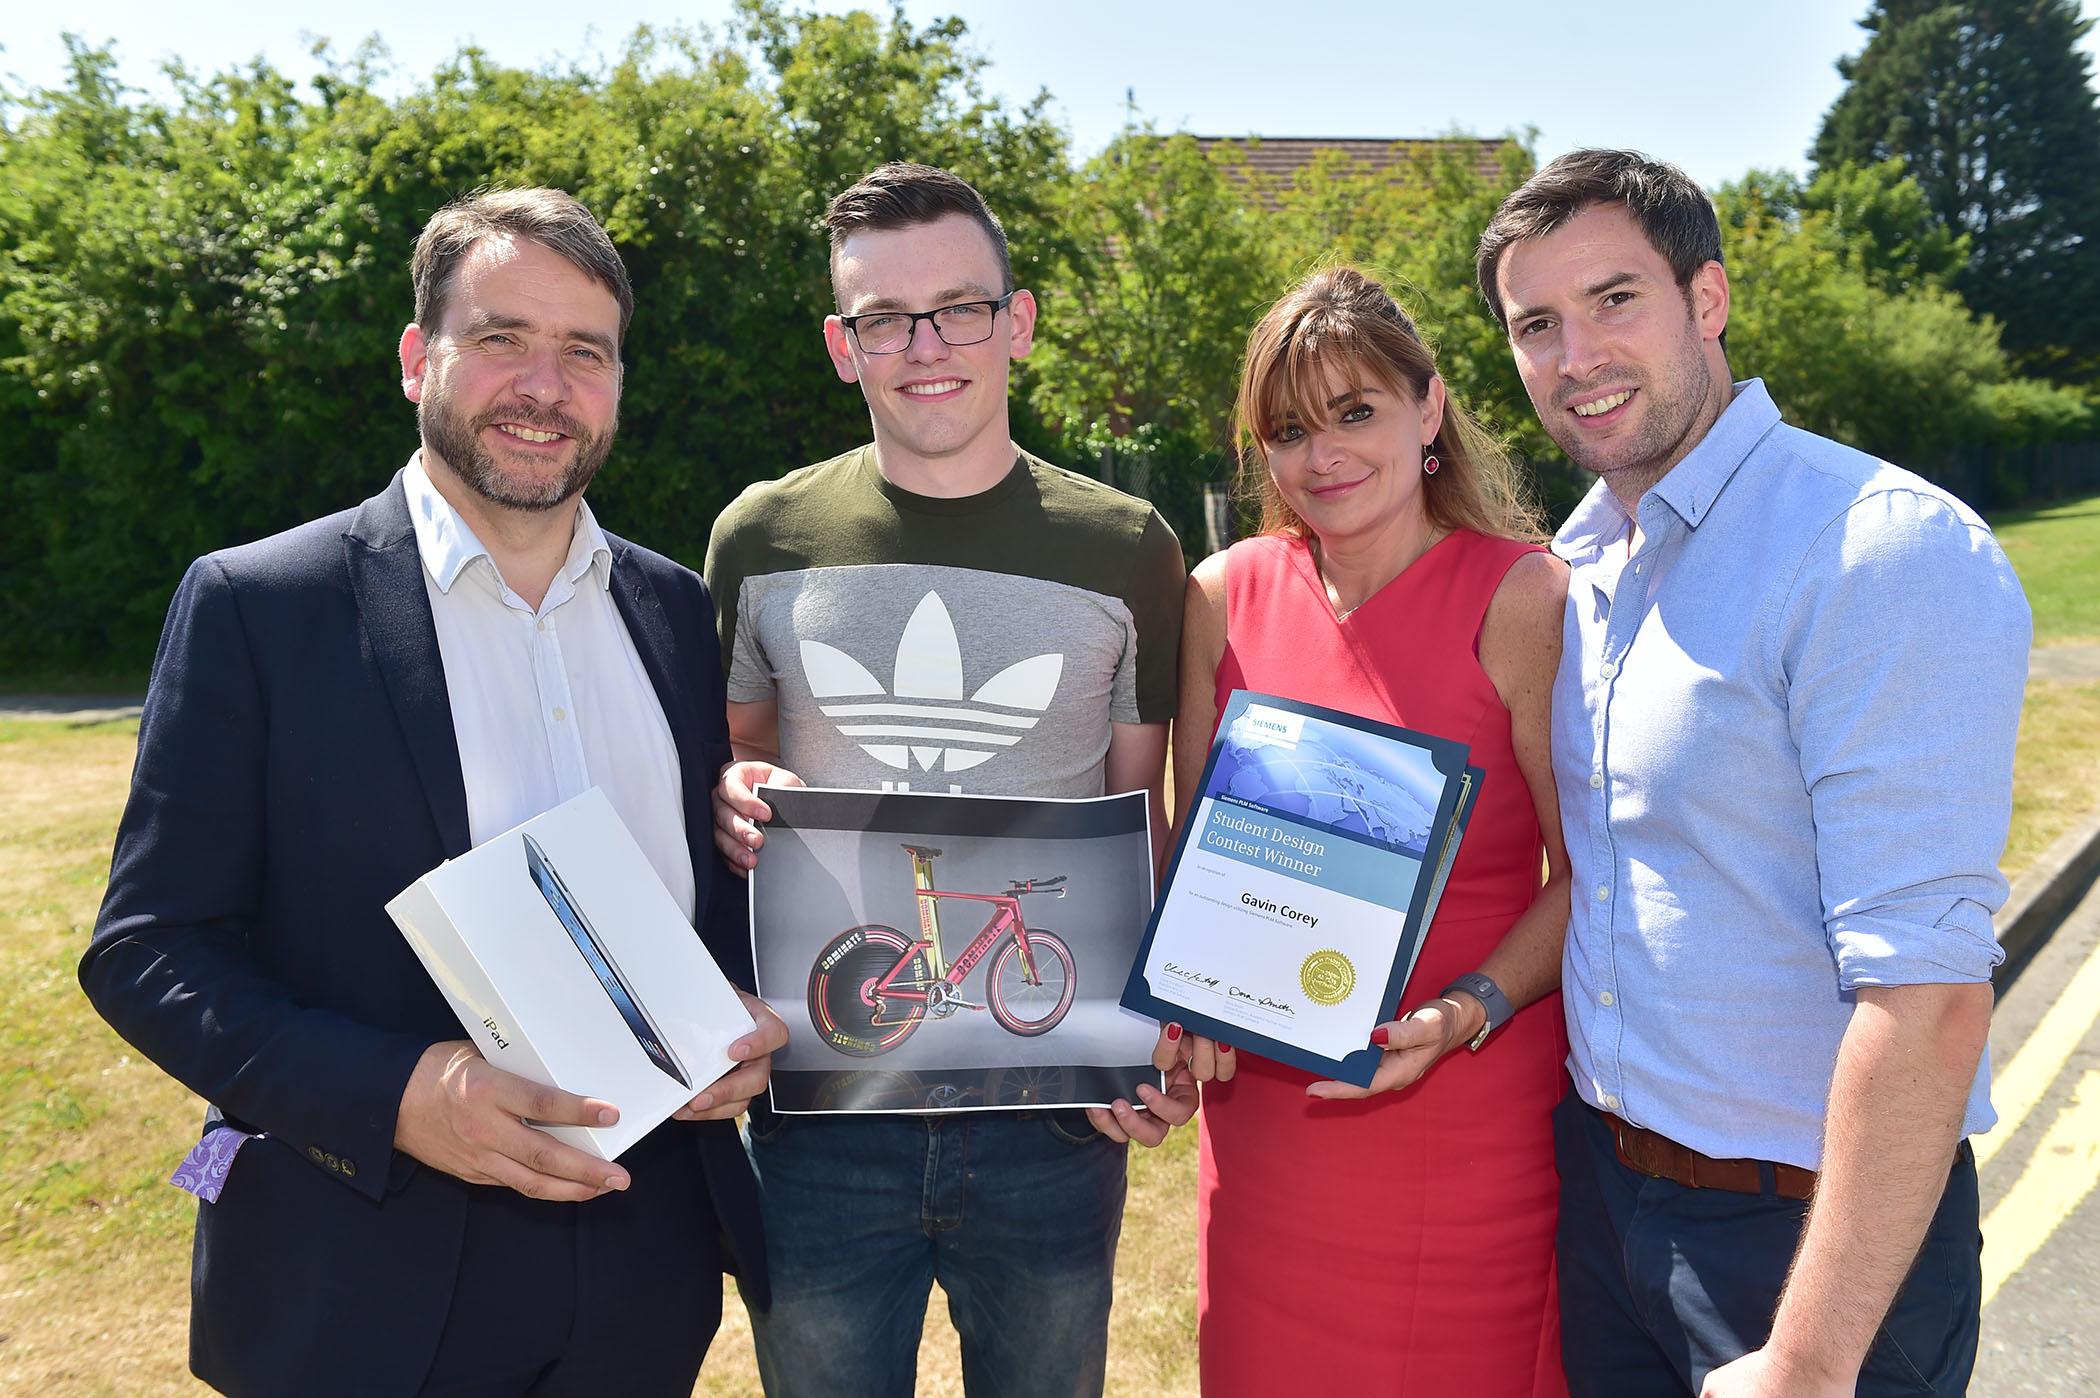 Ulster Engineering Graduates receive Global Design Awards